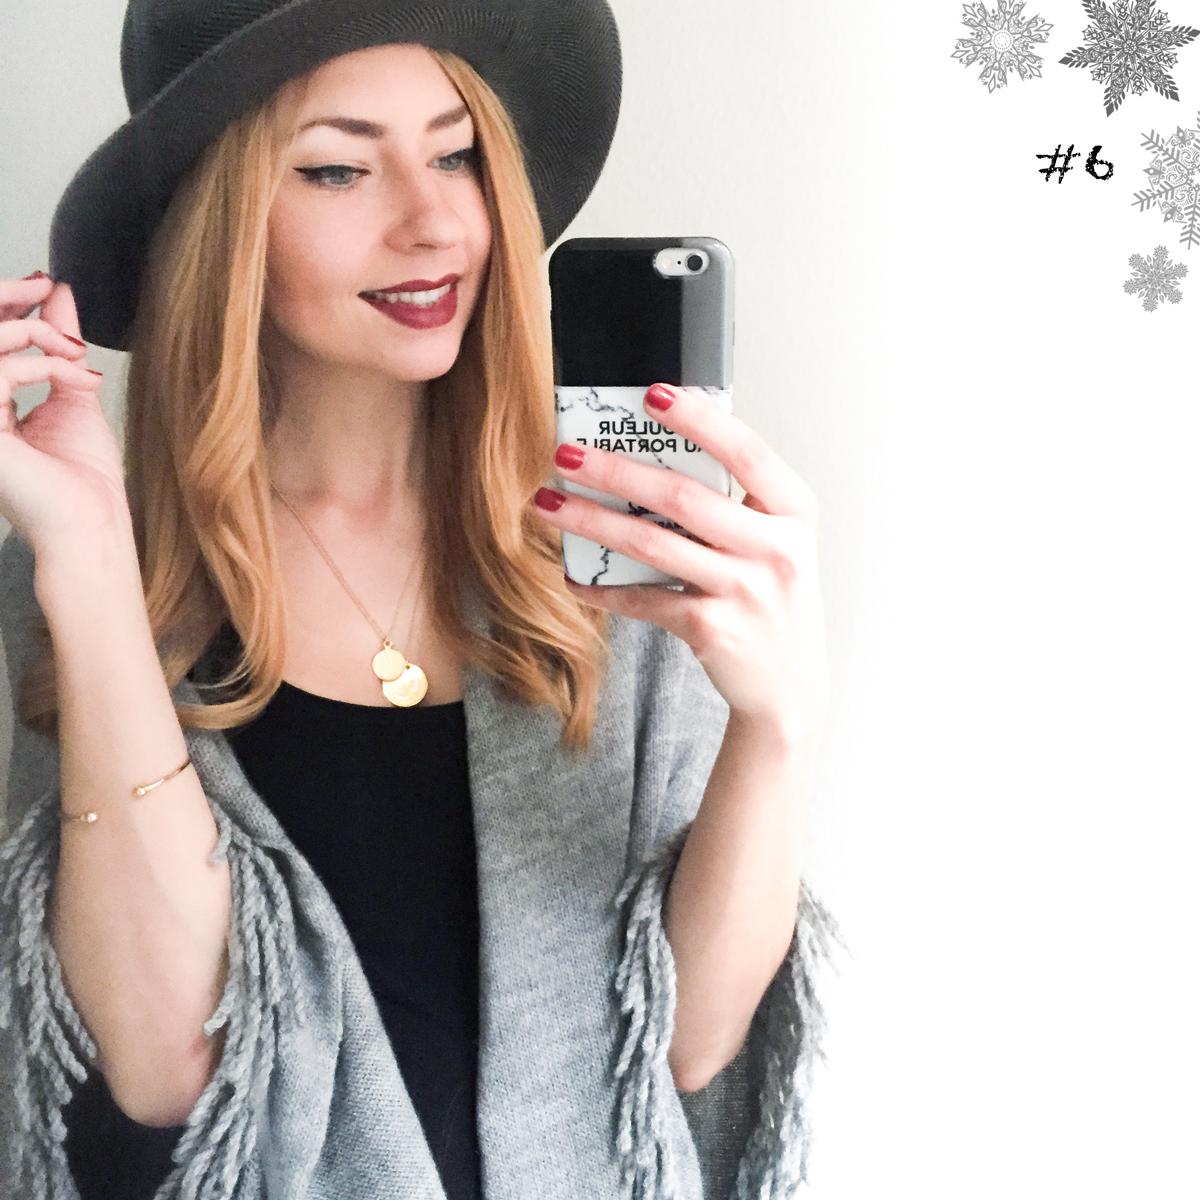 Blogger Adventskalender 2015 II How I met my outfit by Dana Lohmüller II Marc Cain Stola / Cape und Hut von Marc Cain